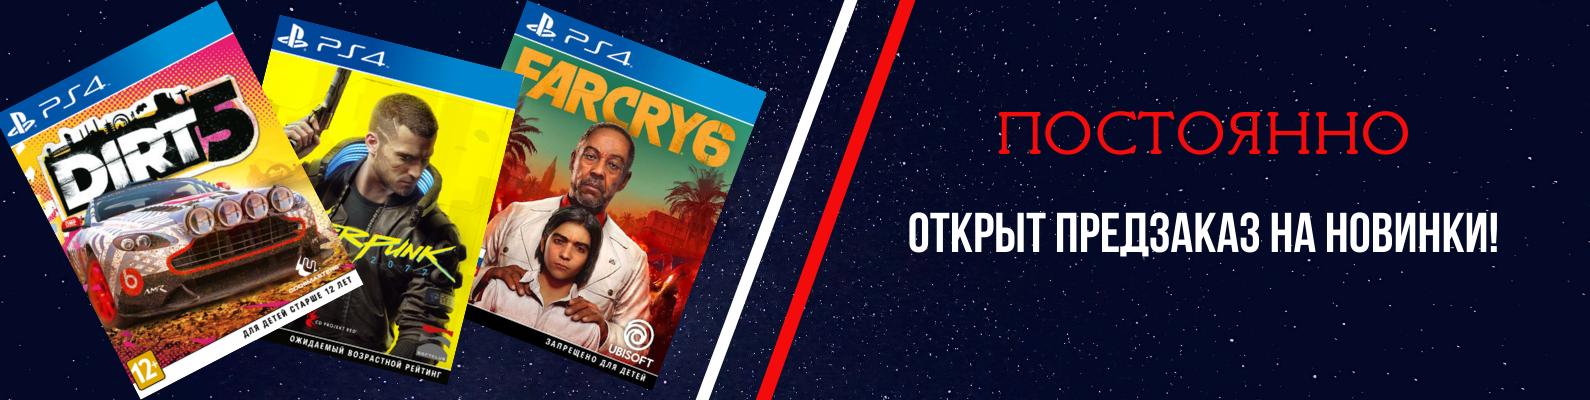 PS4/5: Предзаказ